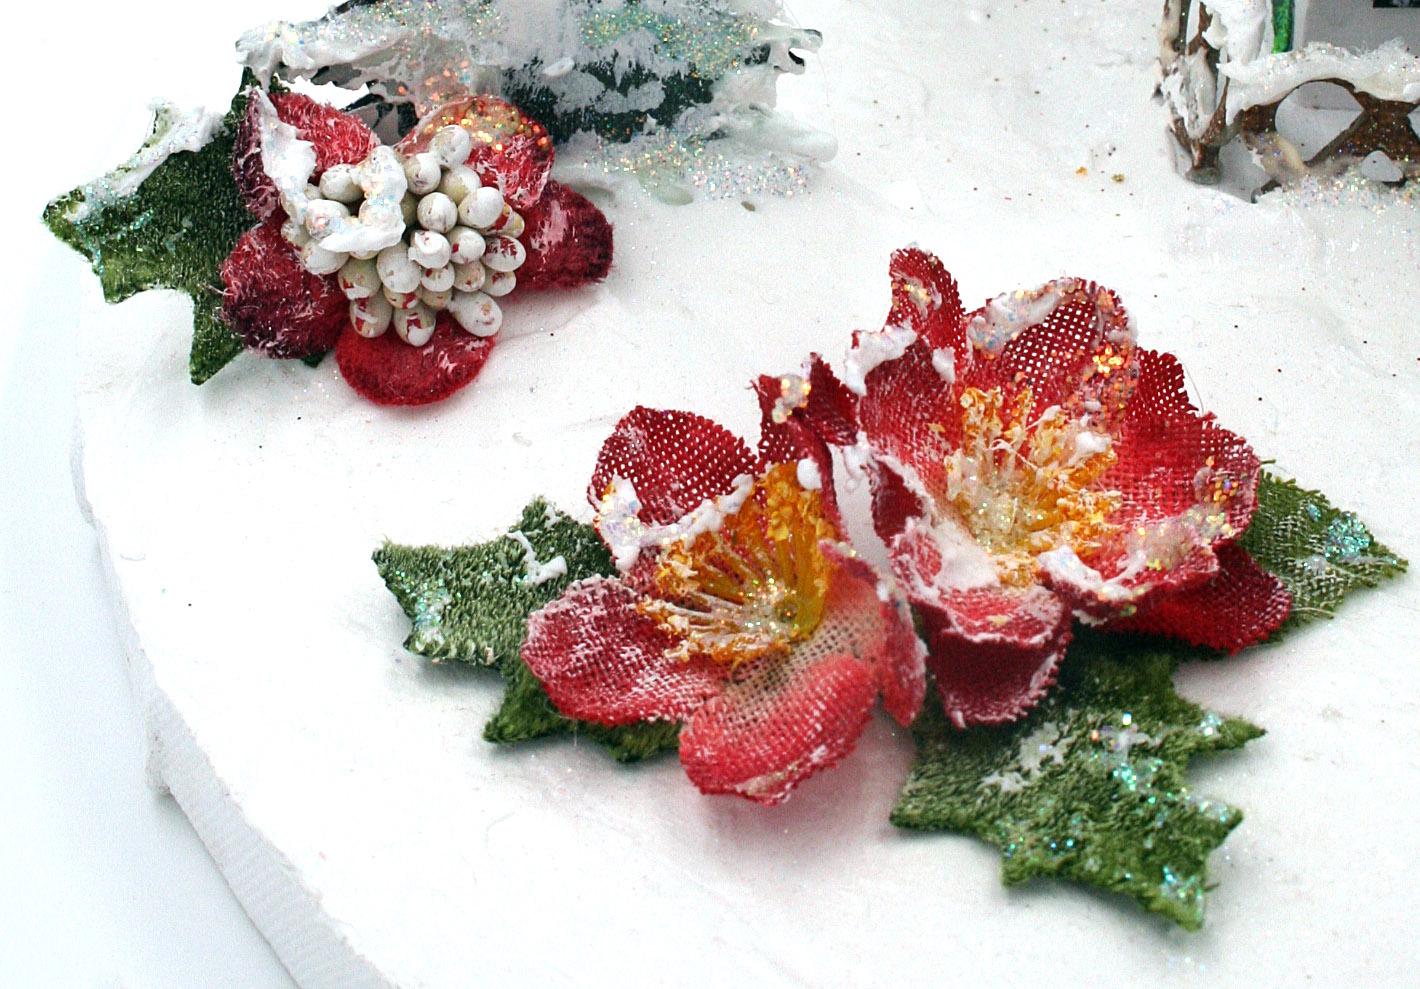 Aleene's Glitter Snow에 대한 이미지 검색결과